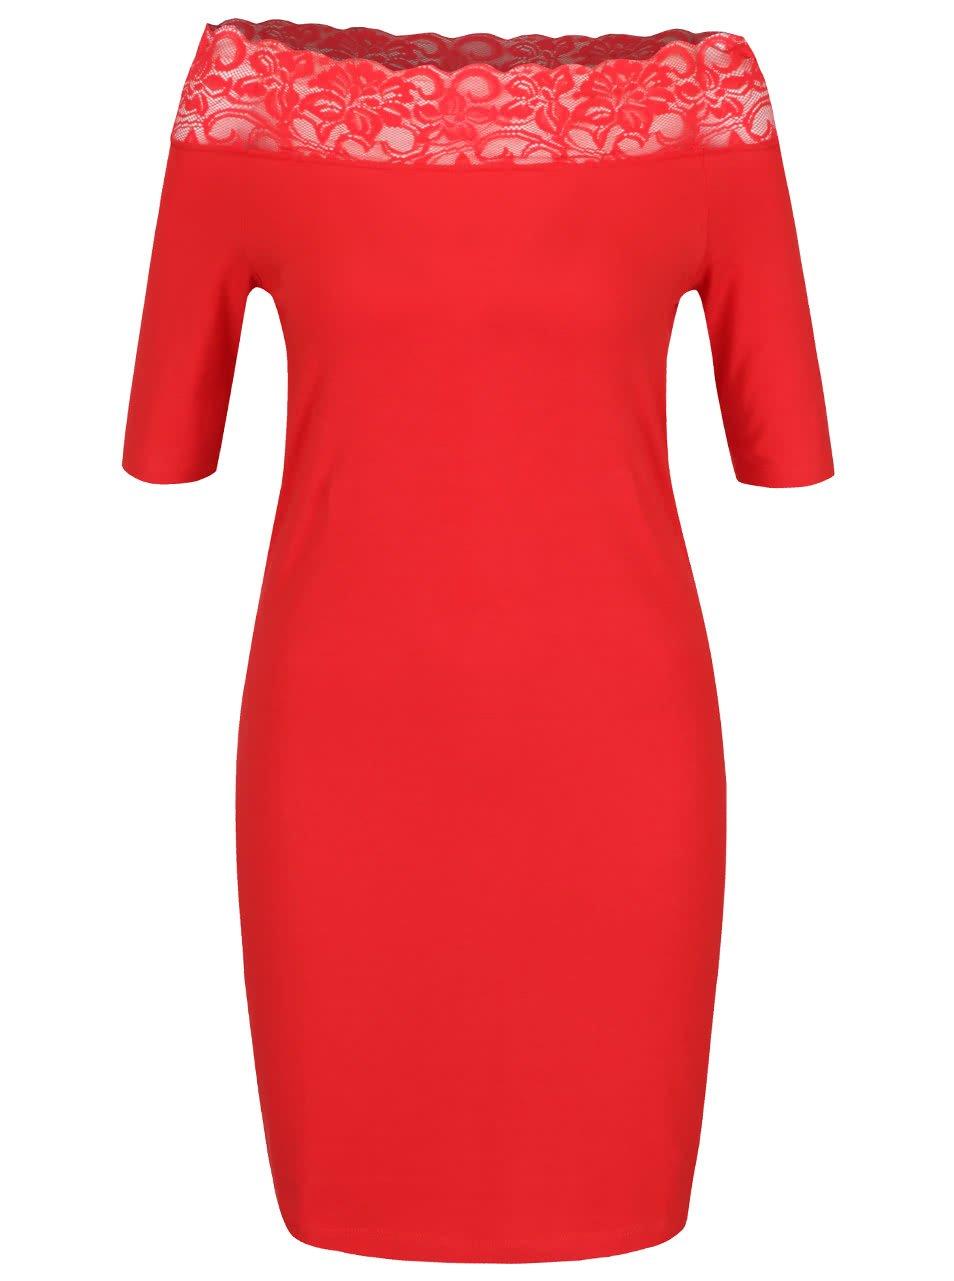 Červené šaty s krajkovým lemem Vero Moda Lacy